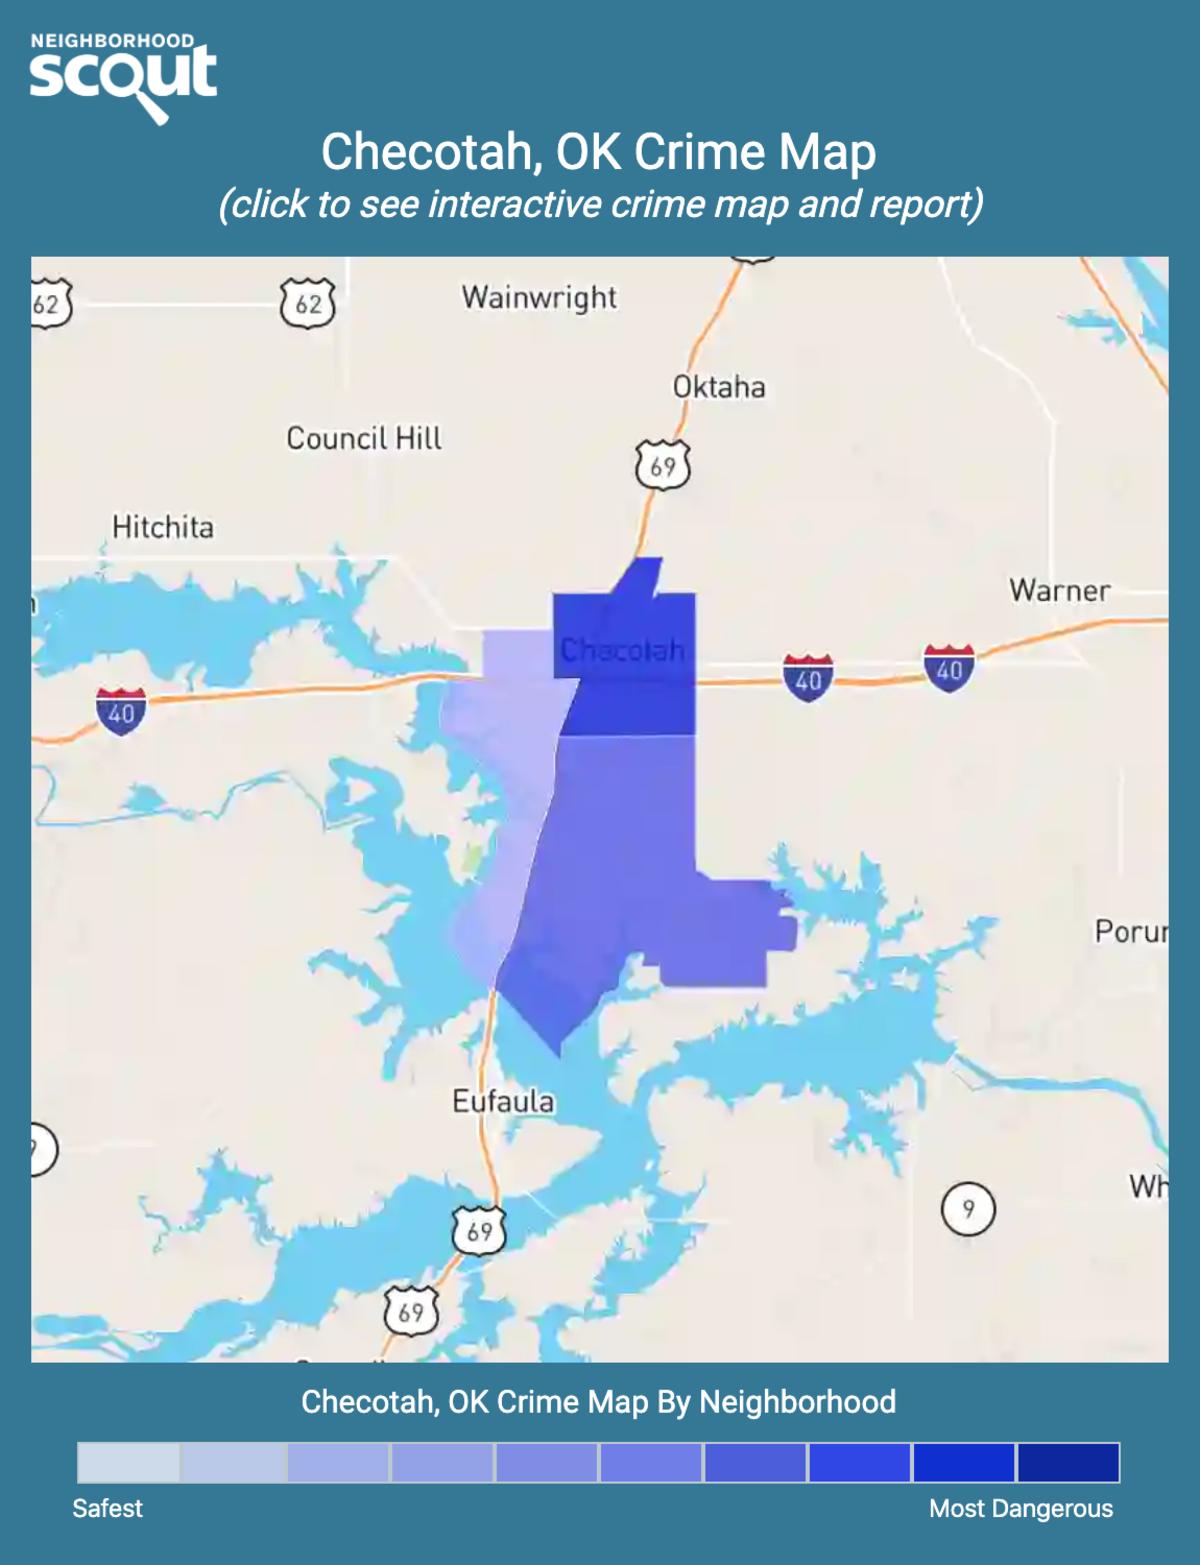 Checotah, Oklahoma crime map